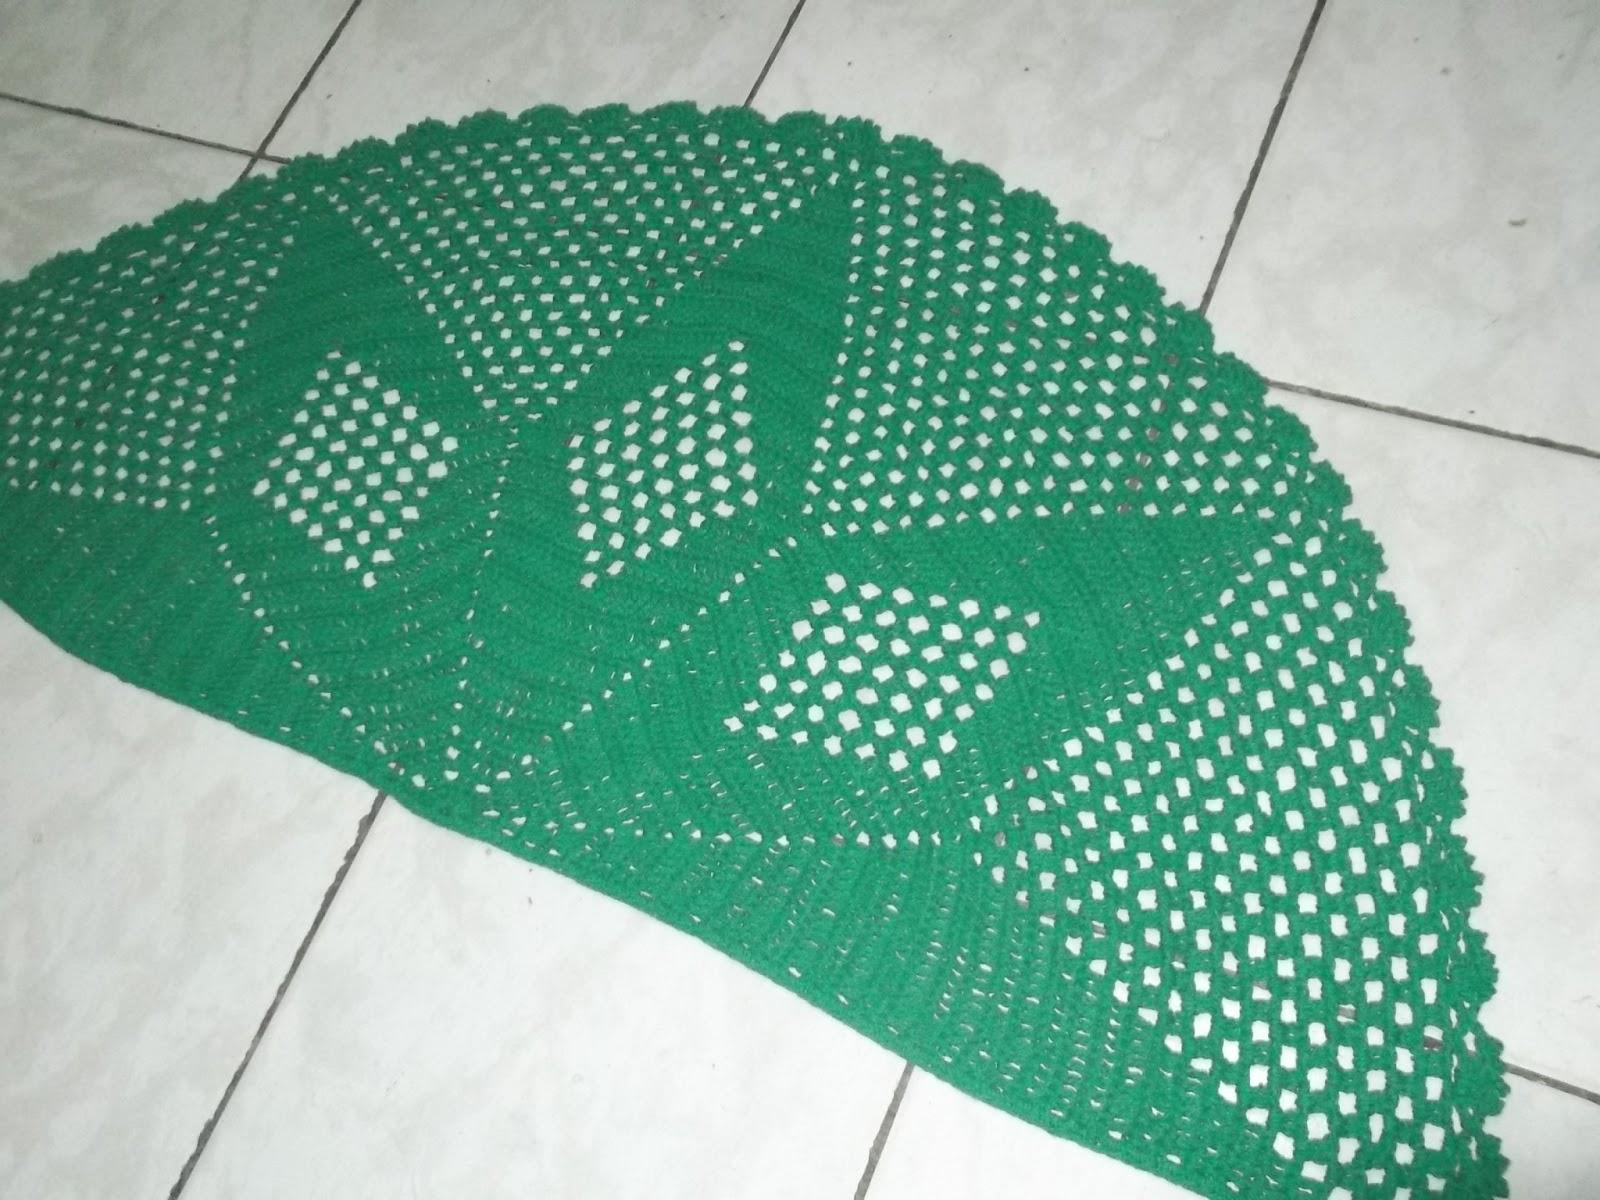 Koizinhas Kon Arty - Crochê   Artesanato  Tapete meia lua - verde ... b9abcd9425824